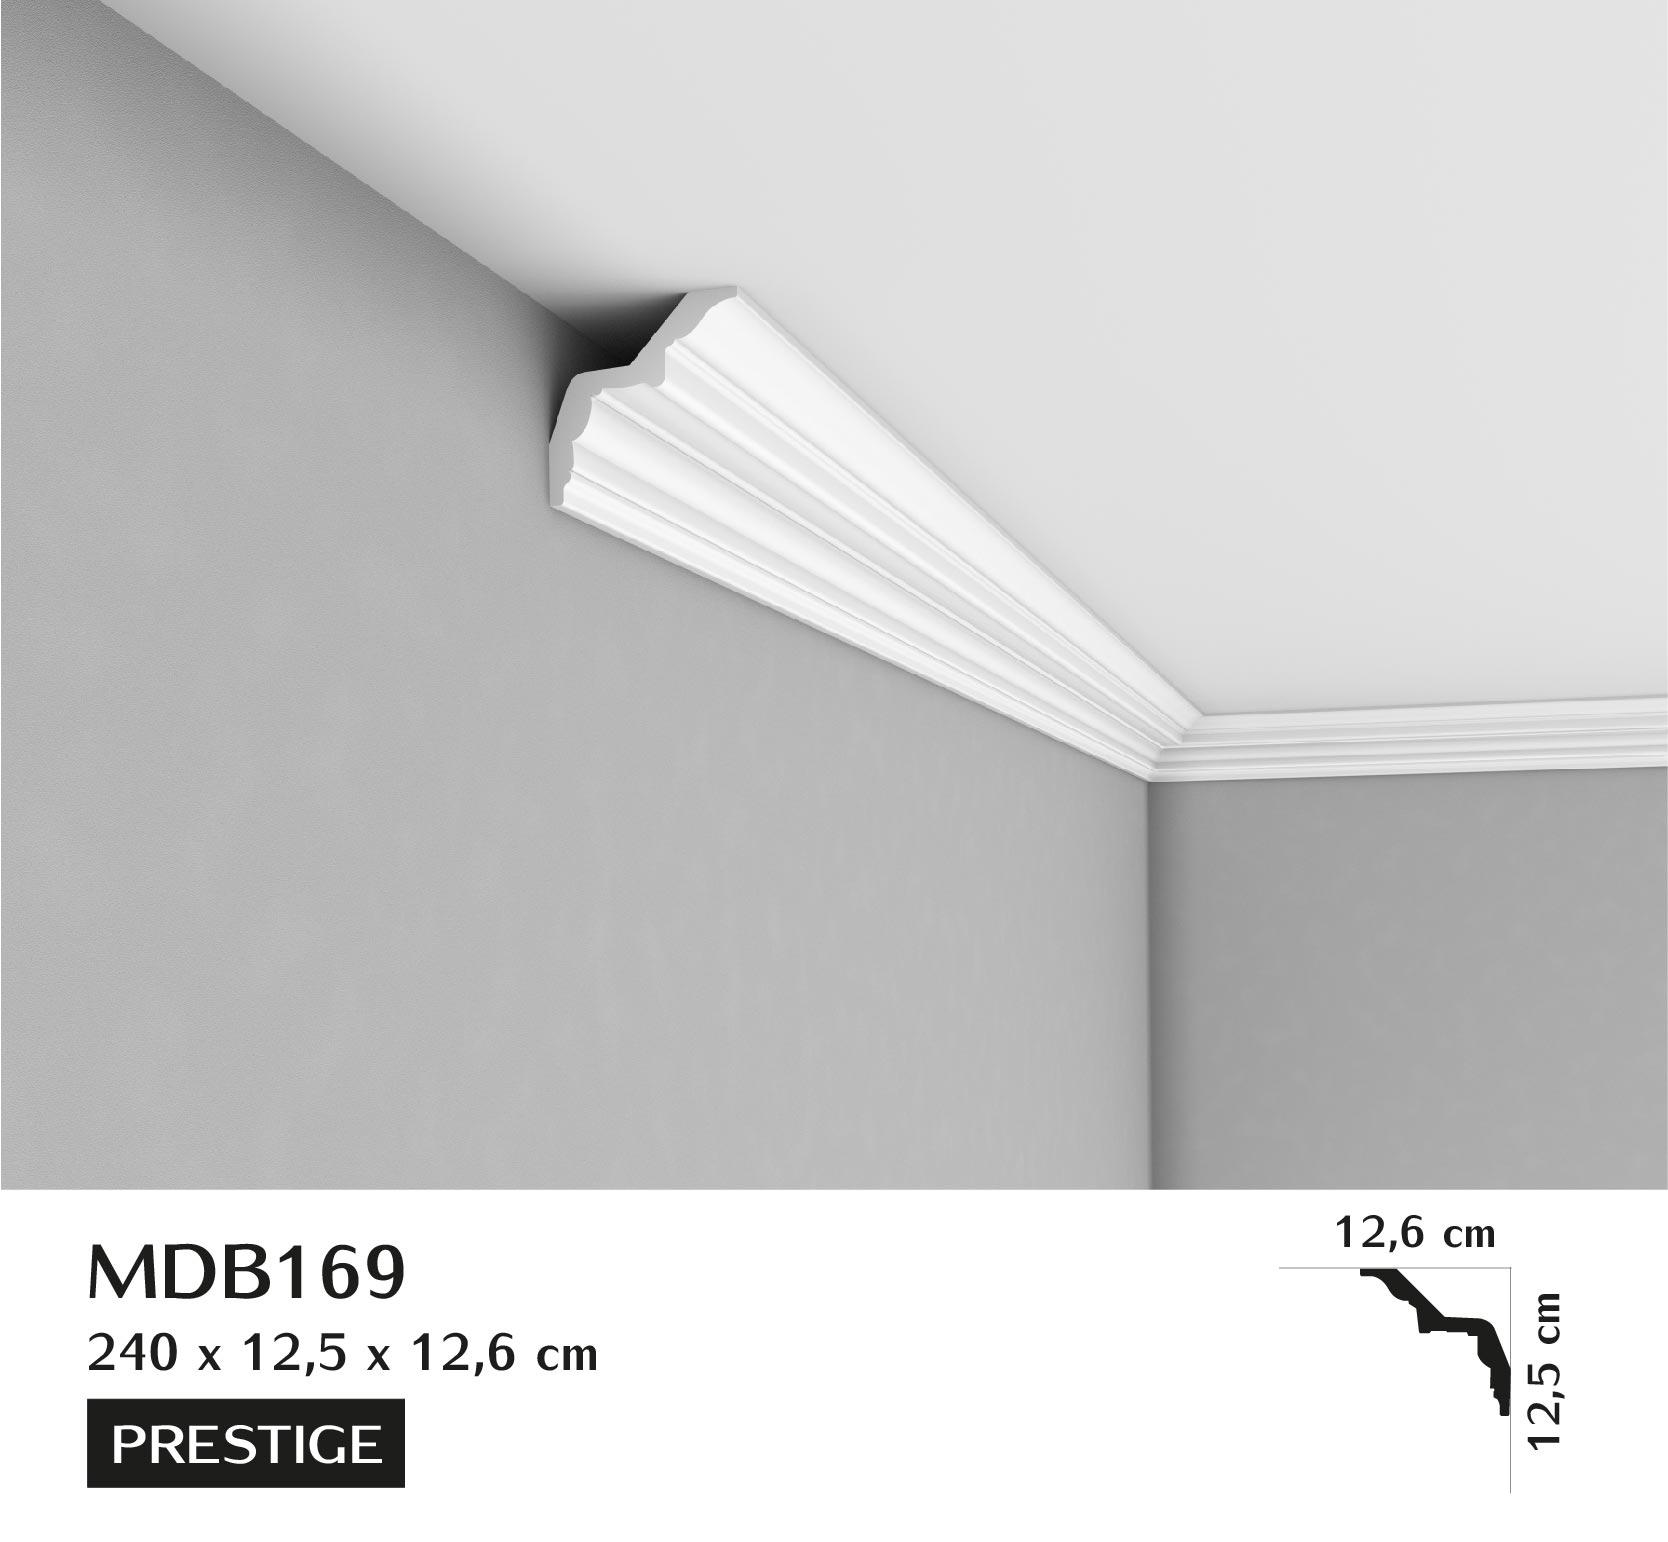 Mdb169